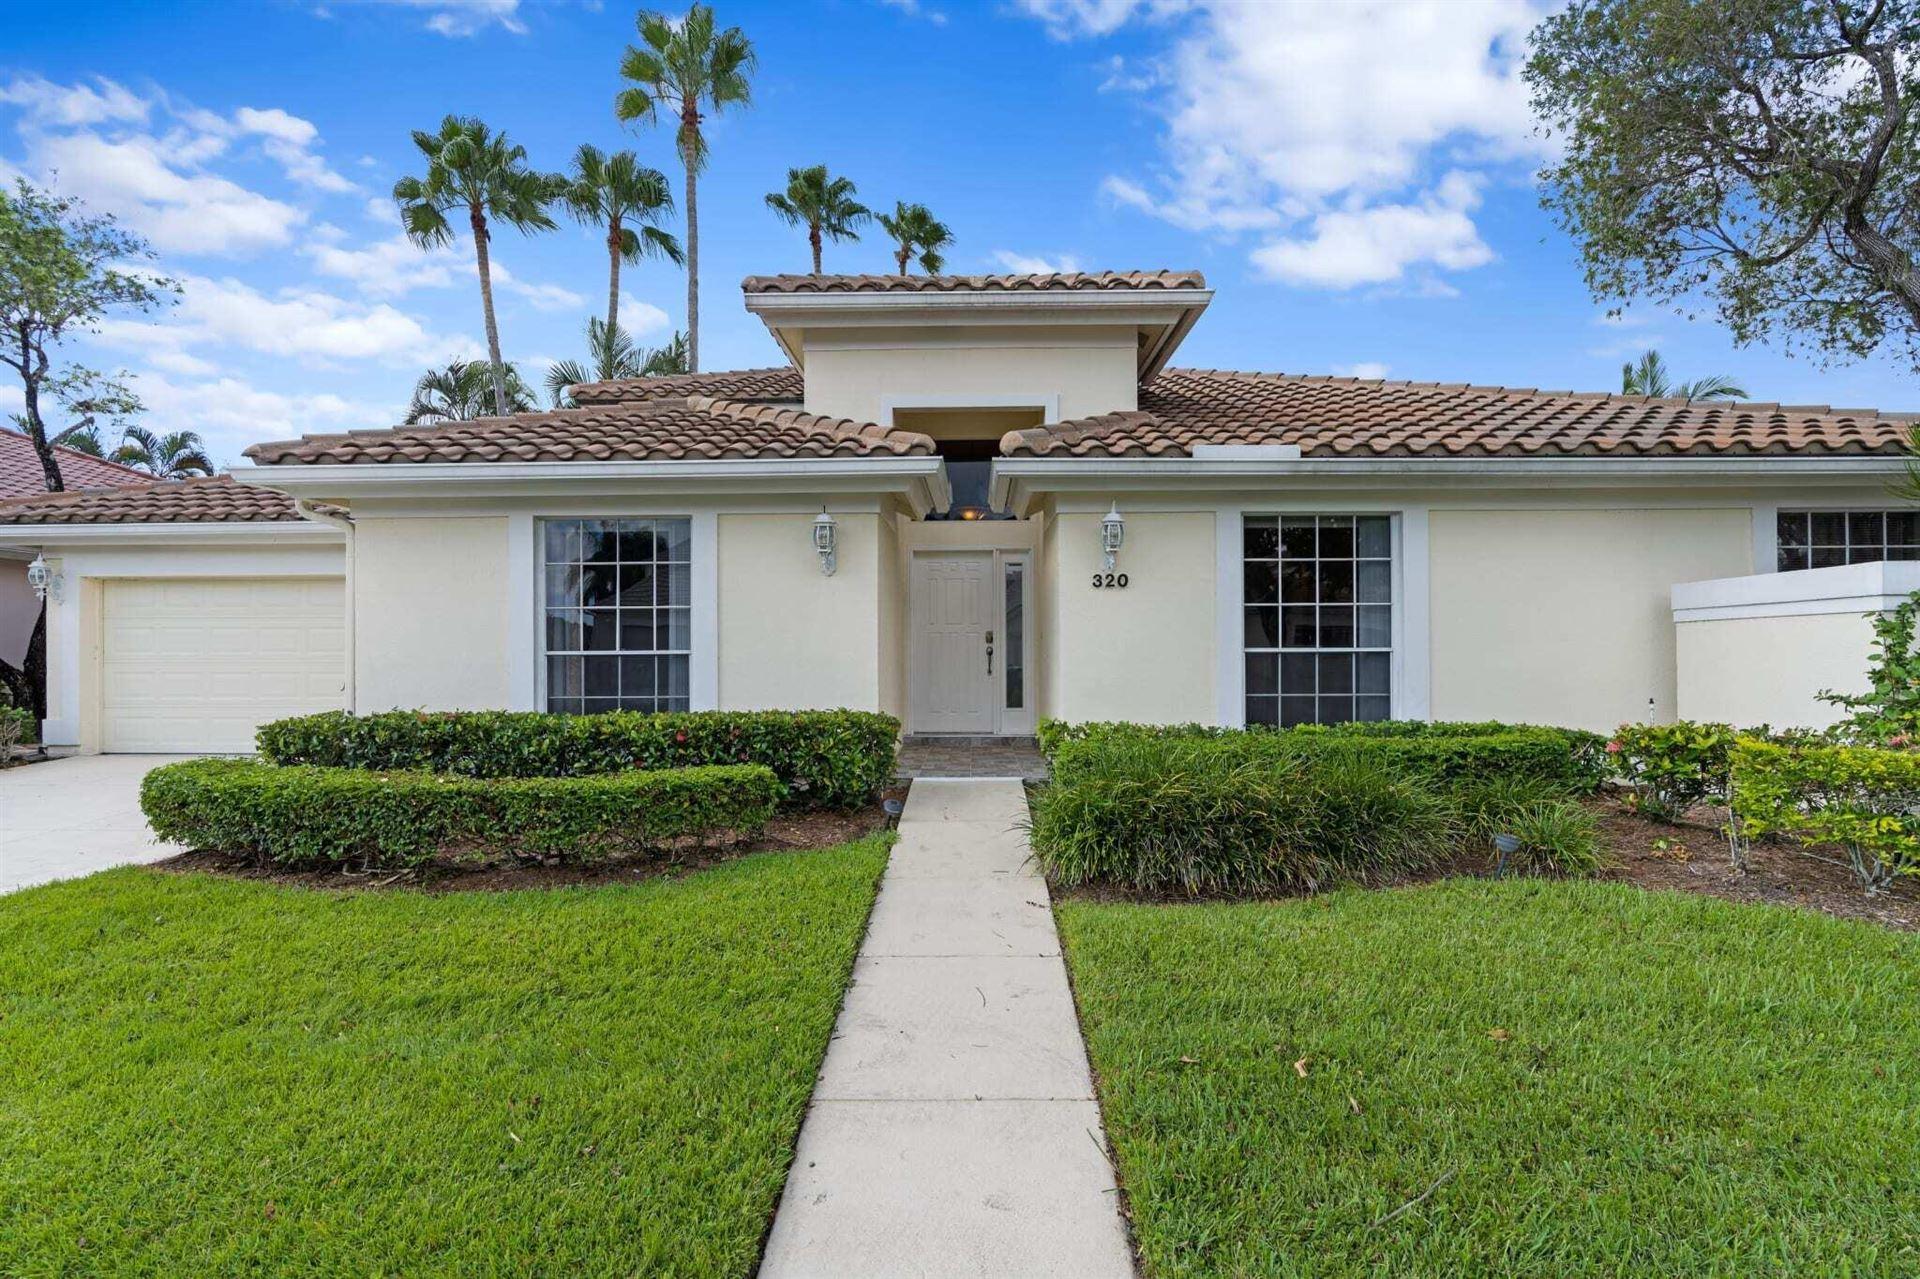 Photo of 320 Eagleton Golf Drive, Palm Beach Gardens, FL 33418 (MLS # RX-10741492)